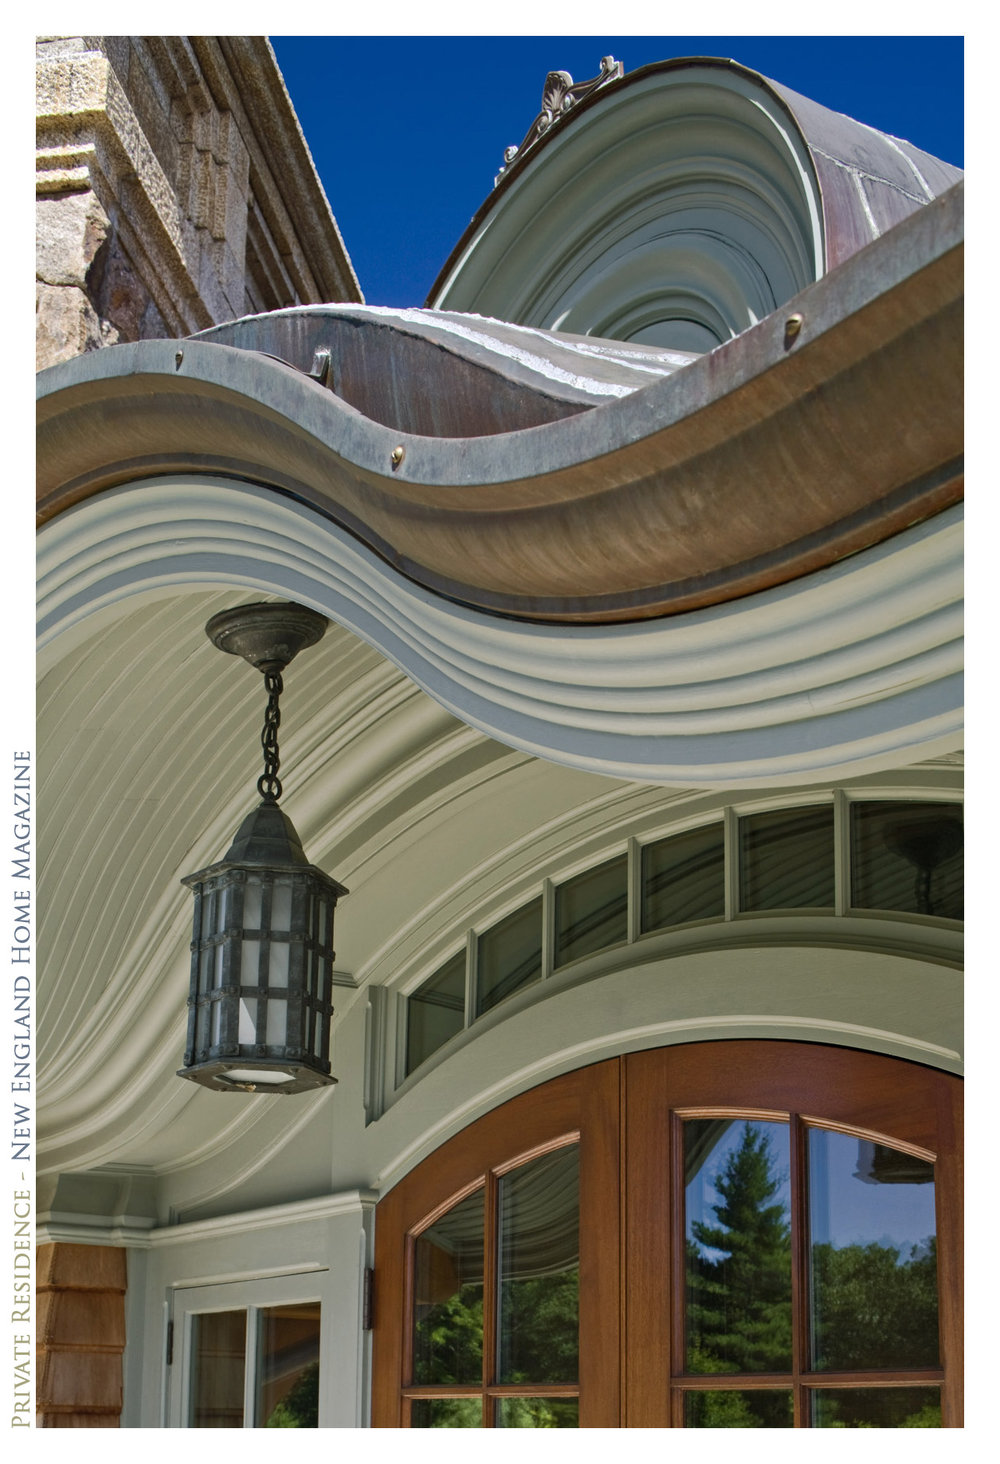 038_Robert-Benson-Photography-Residential-New-England-Home-Magazine-15.JPG